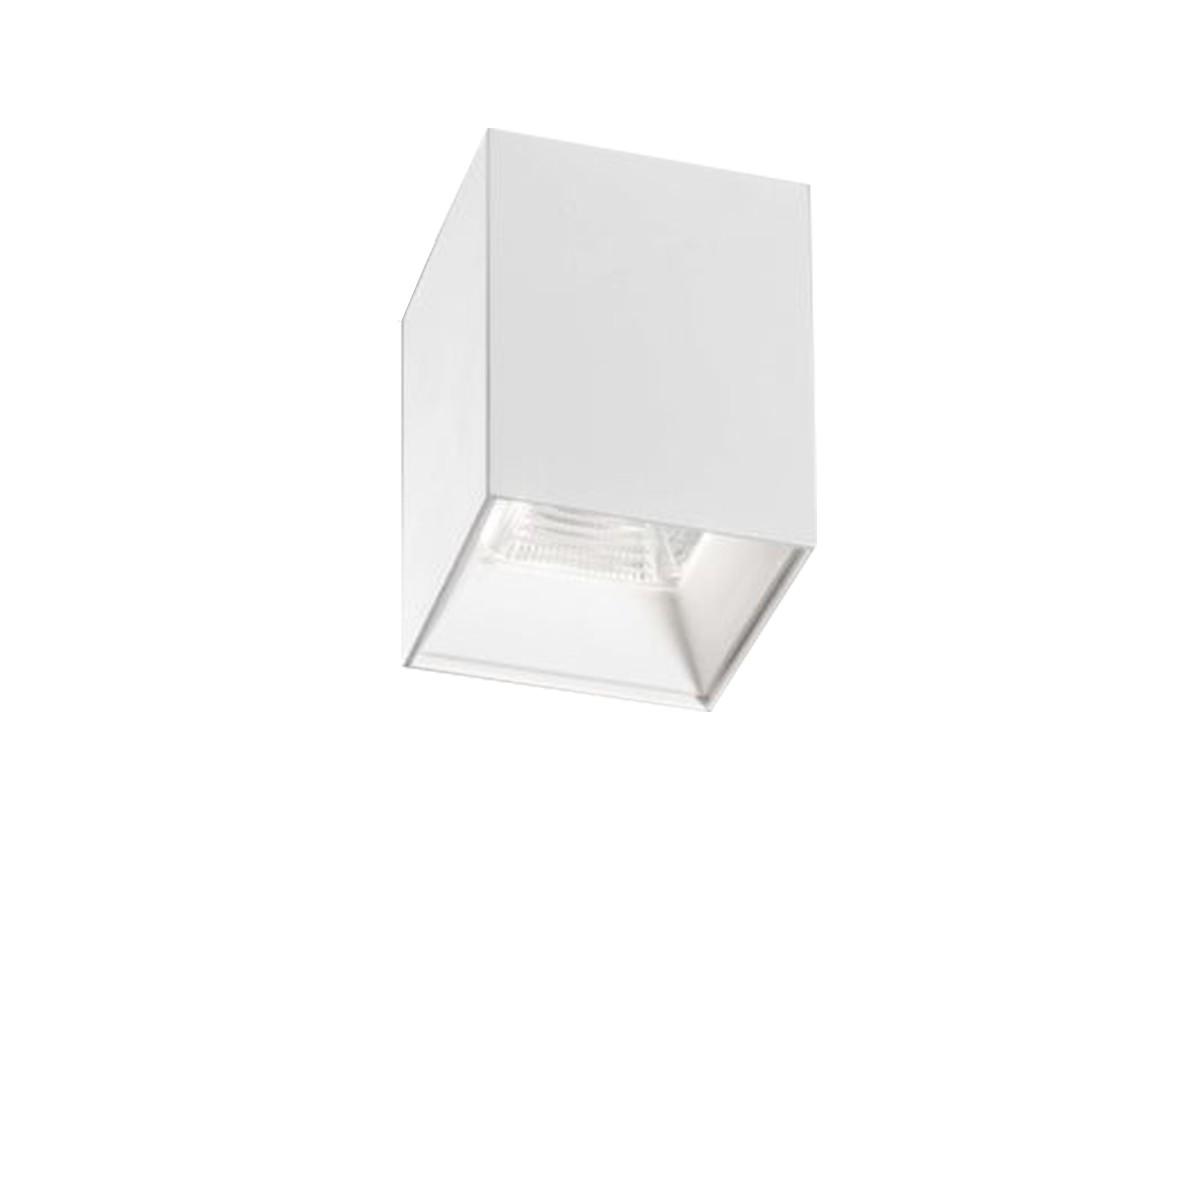 ISYLUCE Spot LED 925 Cubo di Isy Luce